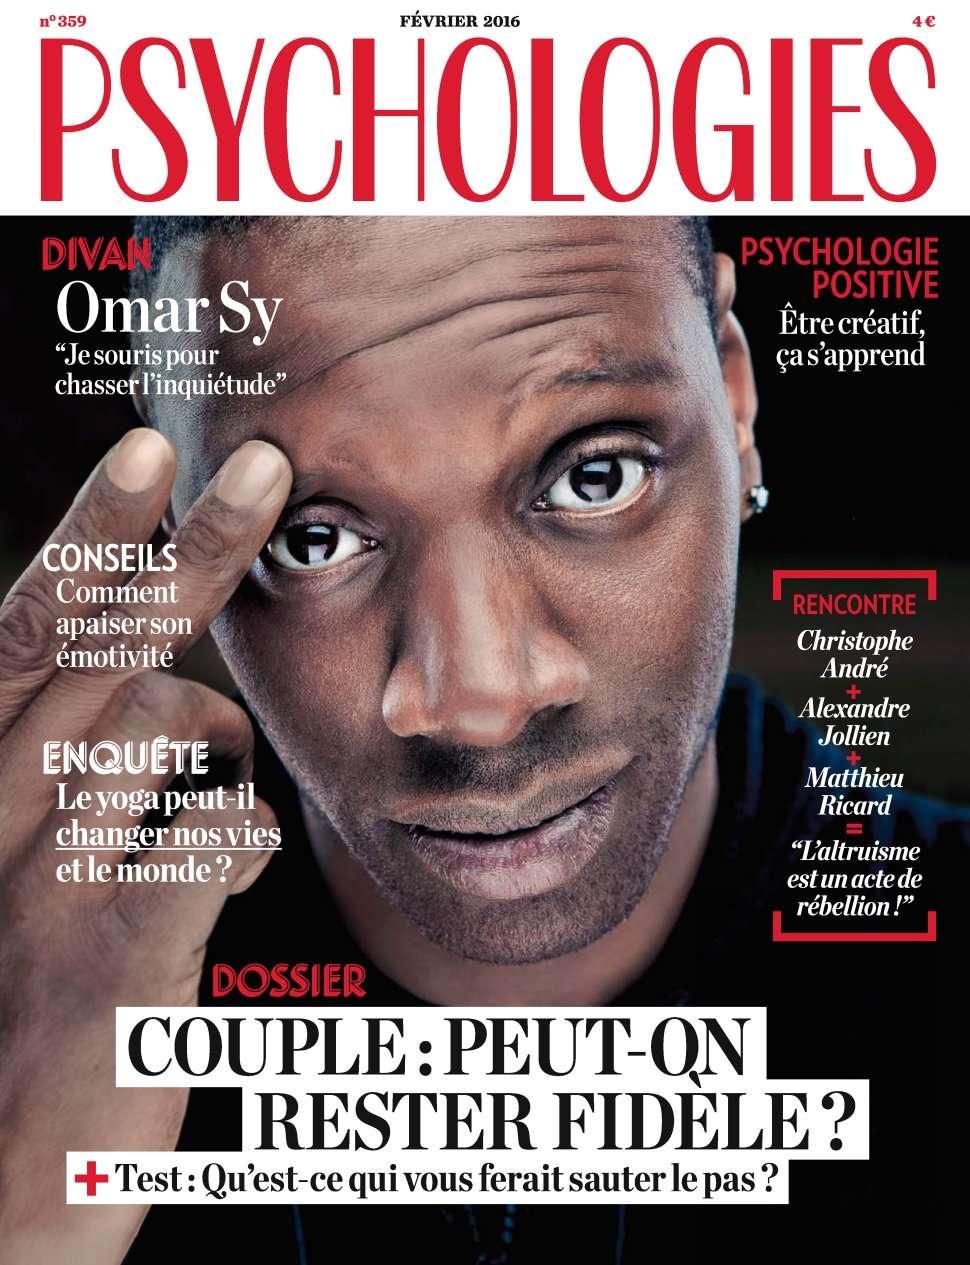 Psychologies magazine 359 - Février 2016